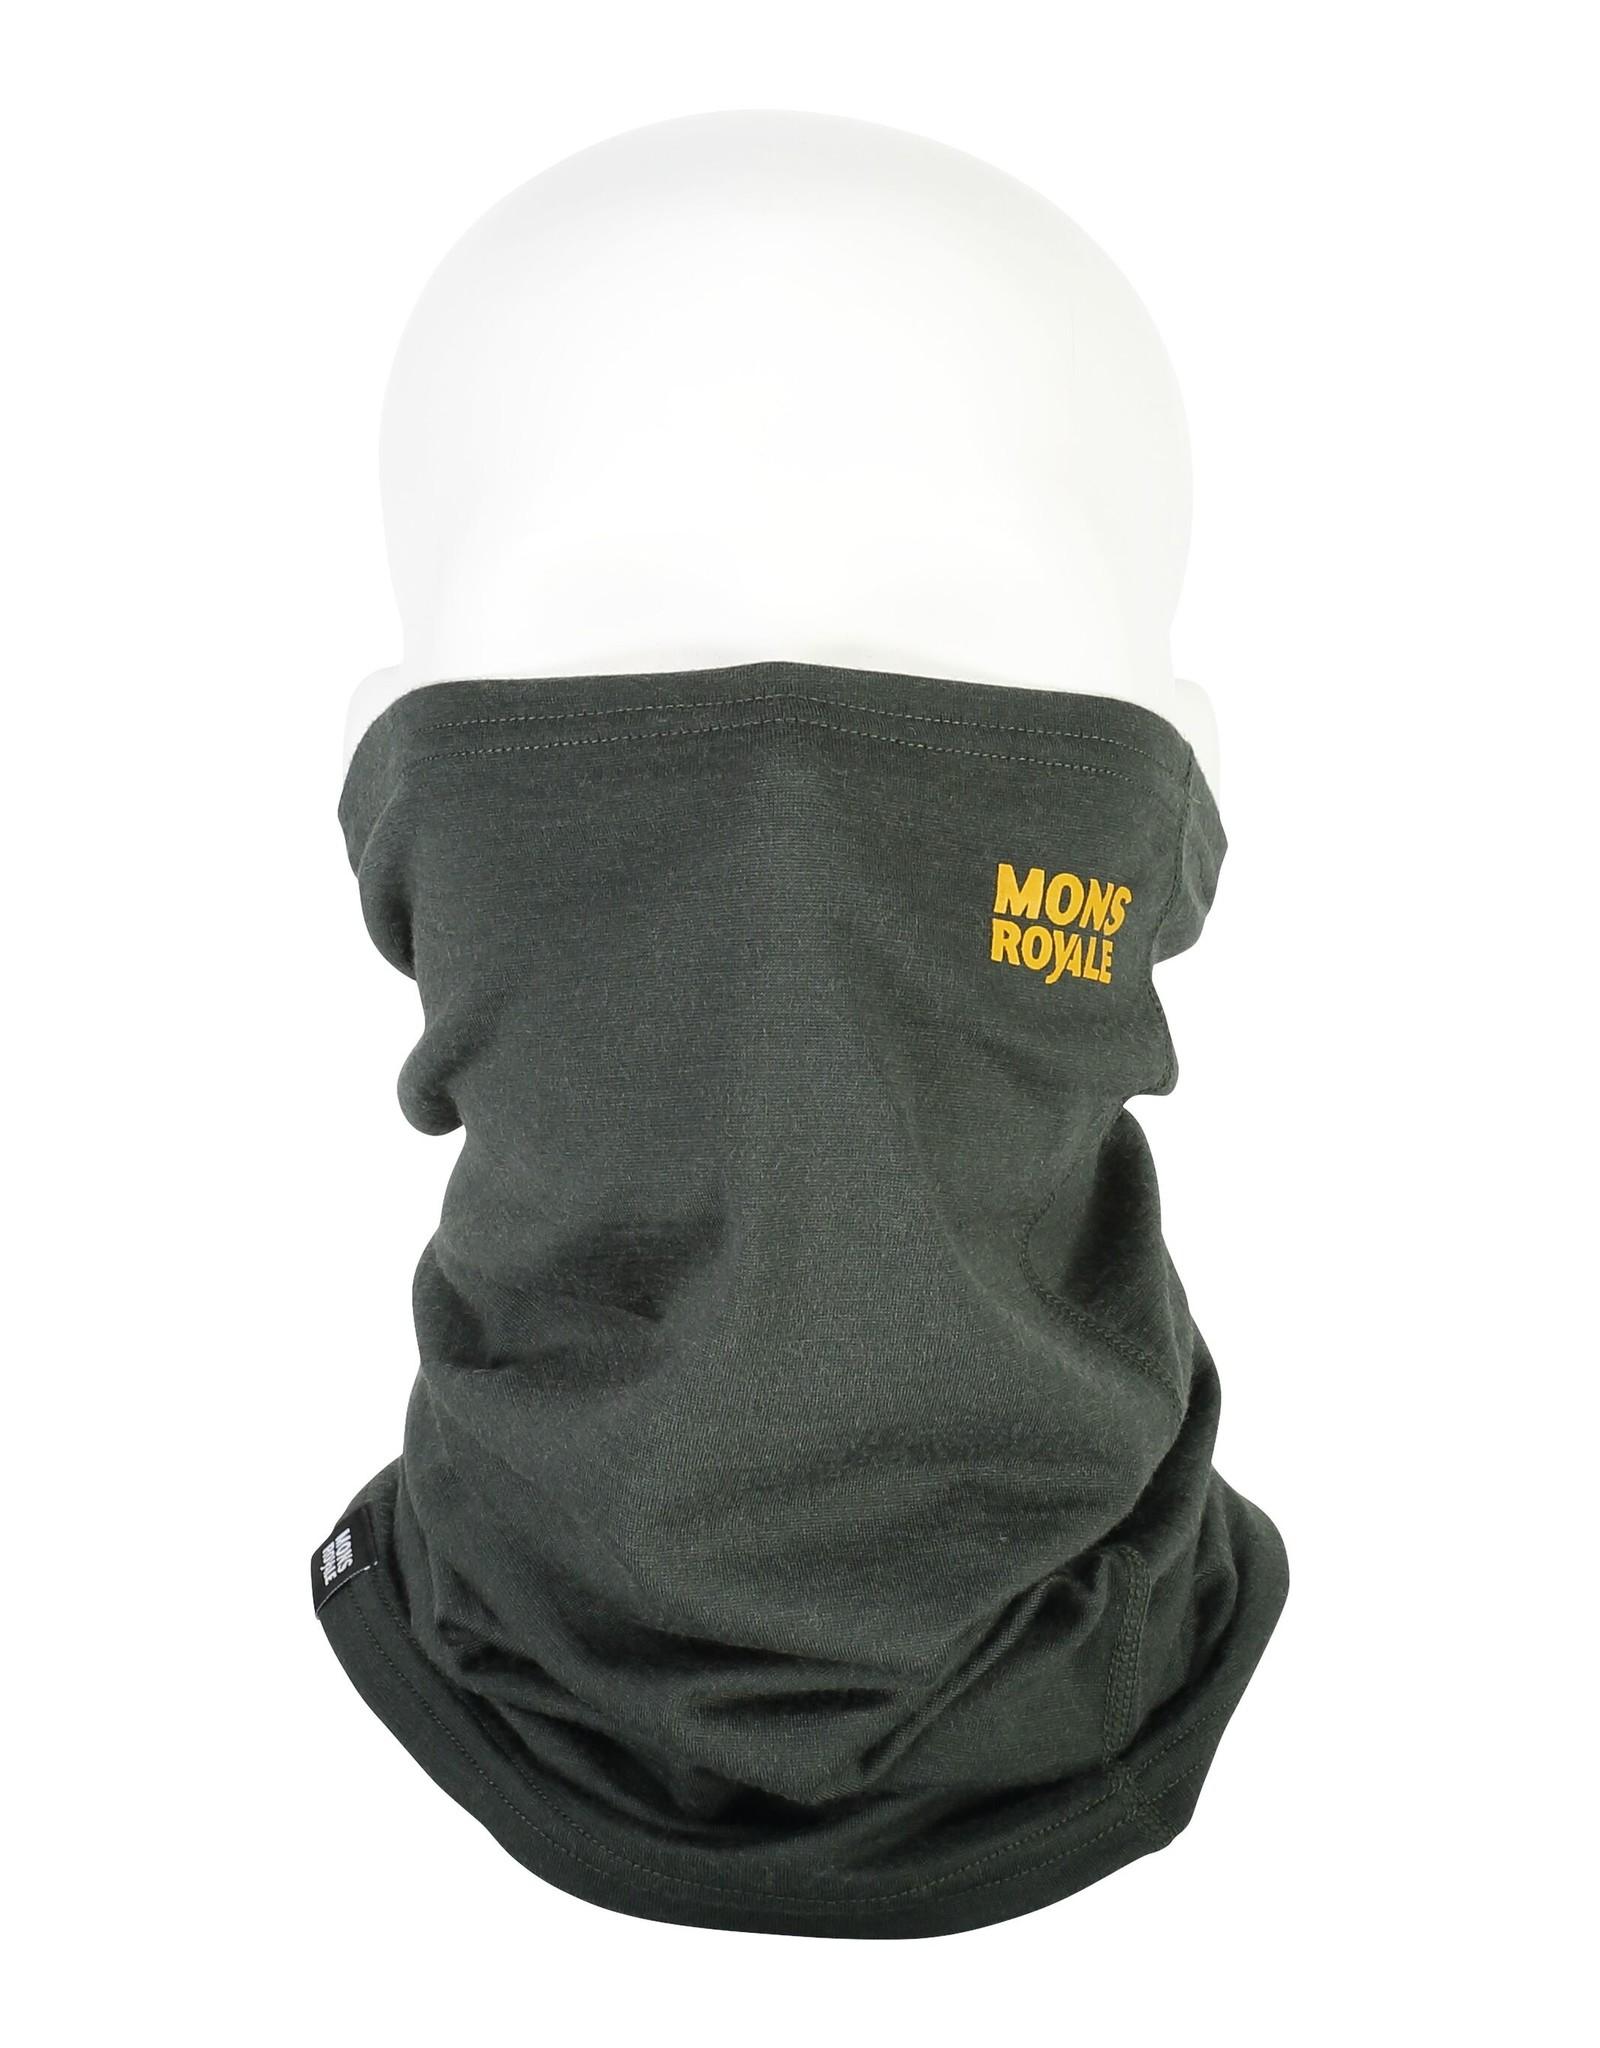 Mons Royale Mons Royale Daily Dose Neckwarmer -Unisex -W2020